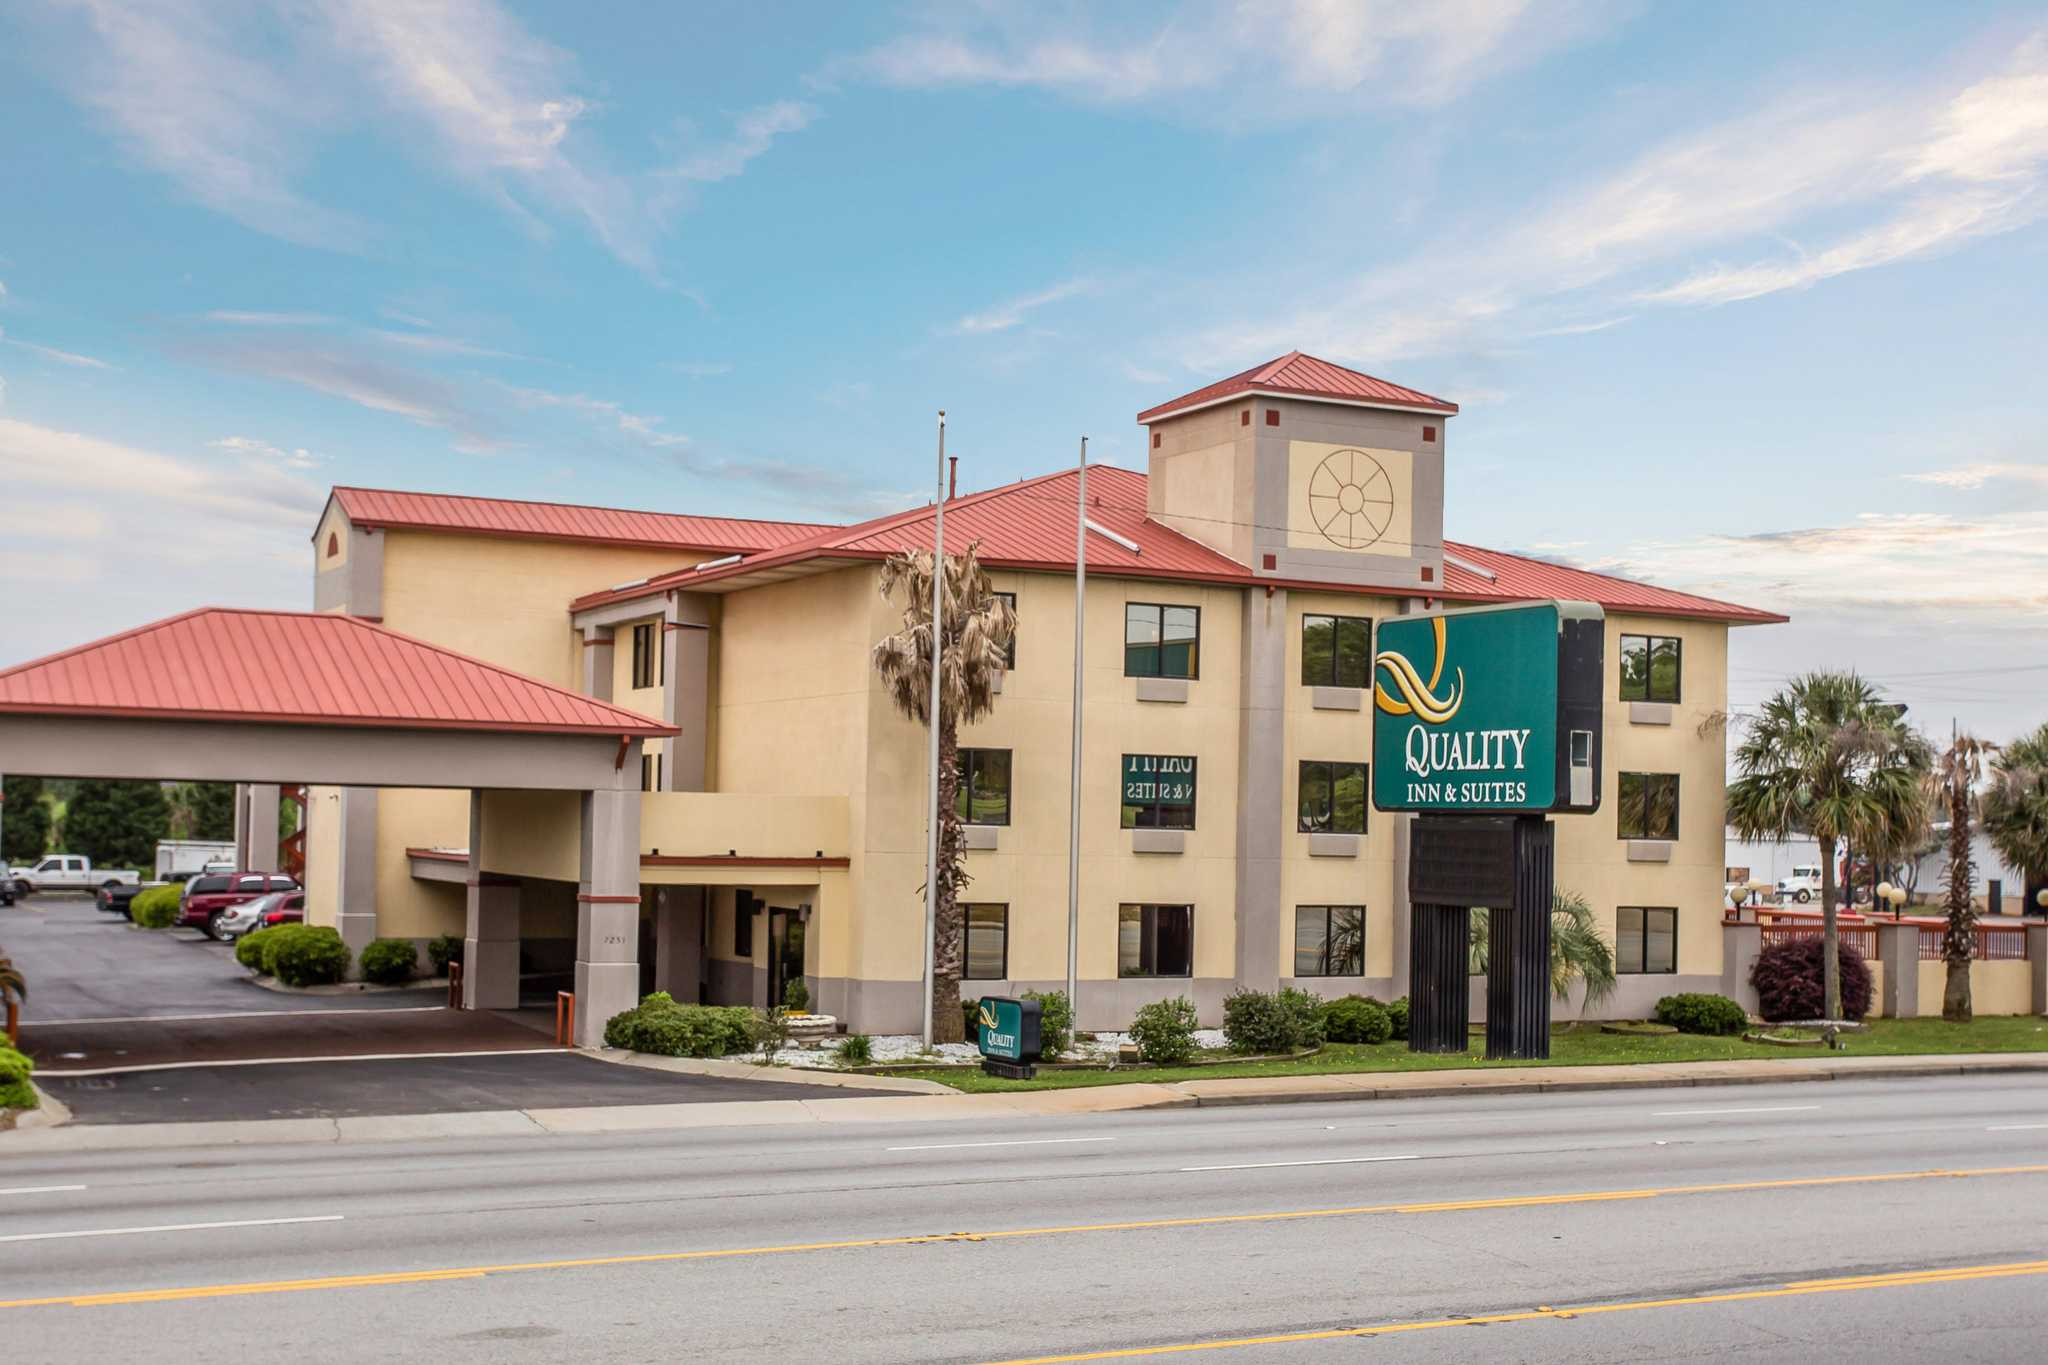 Quality Inn & Suites Ft. Jackson Maingate image 0